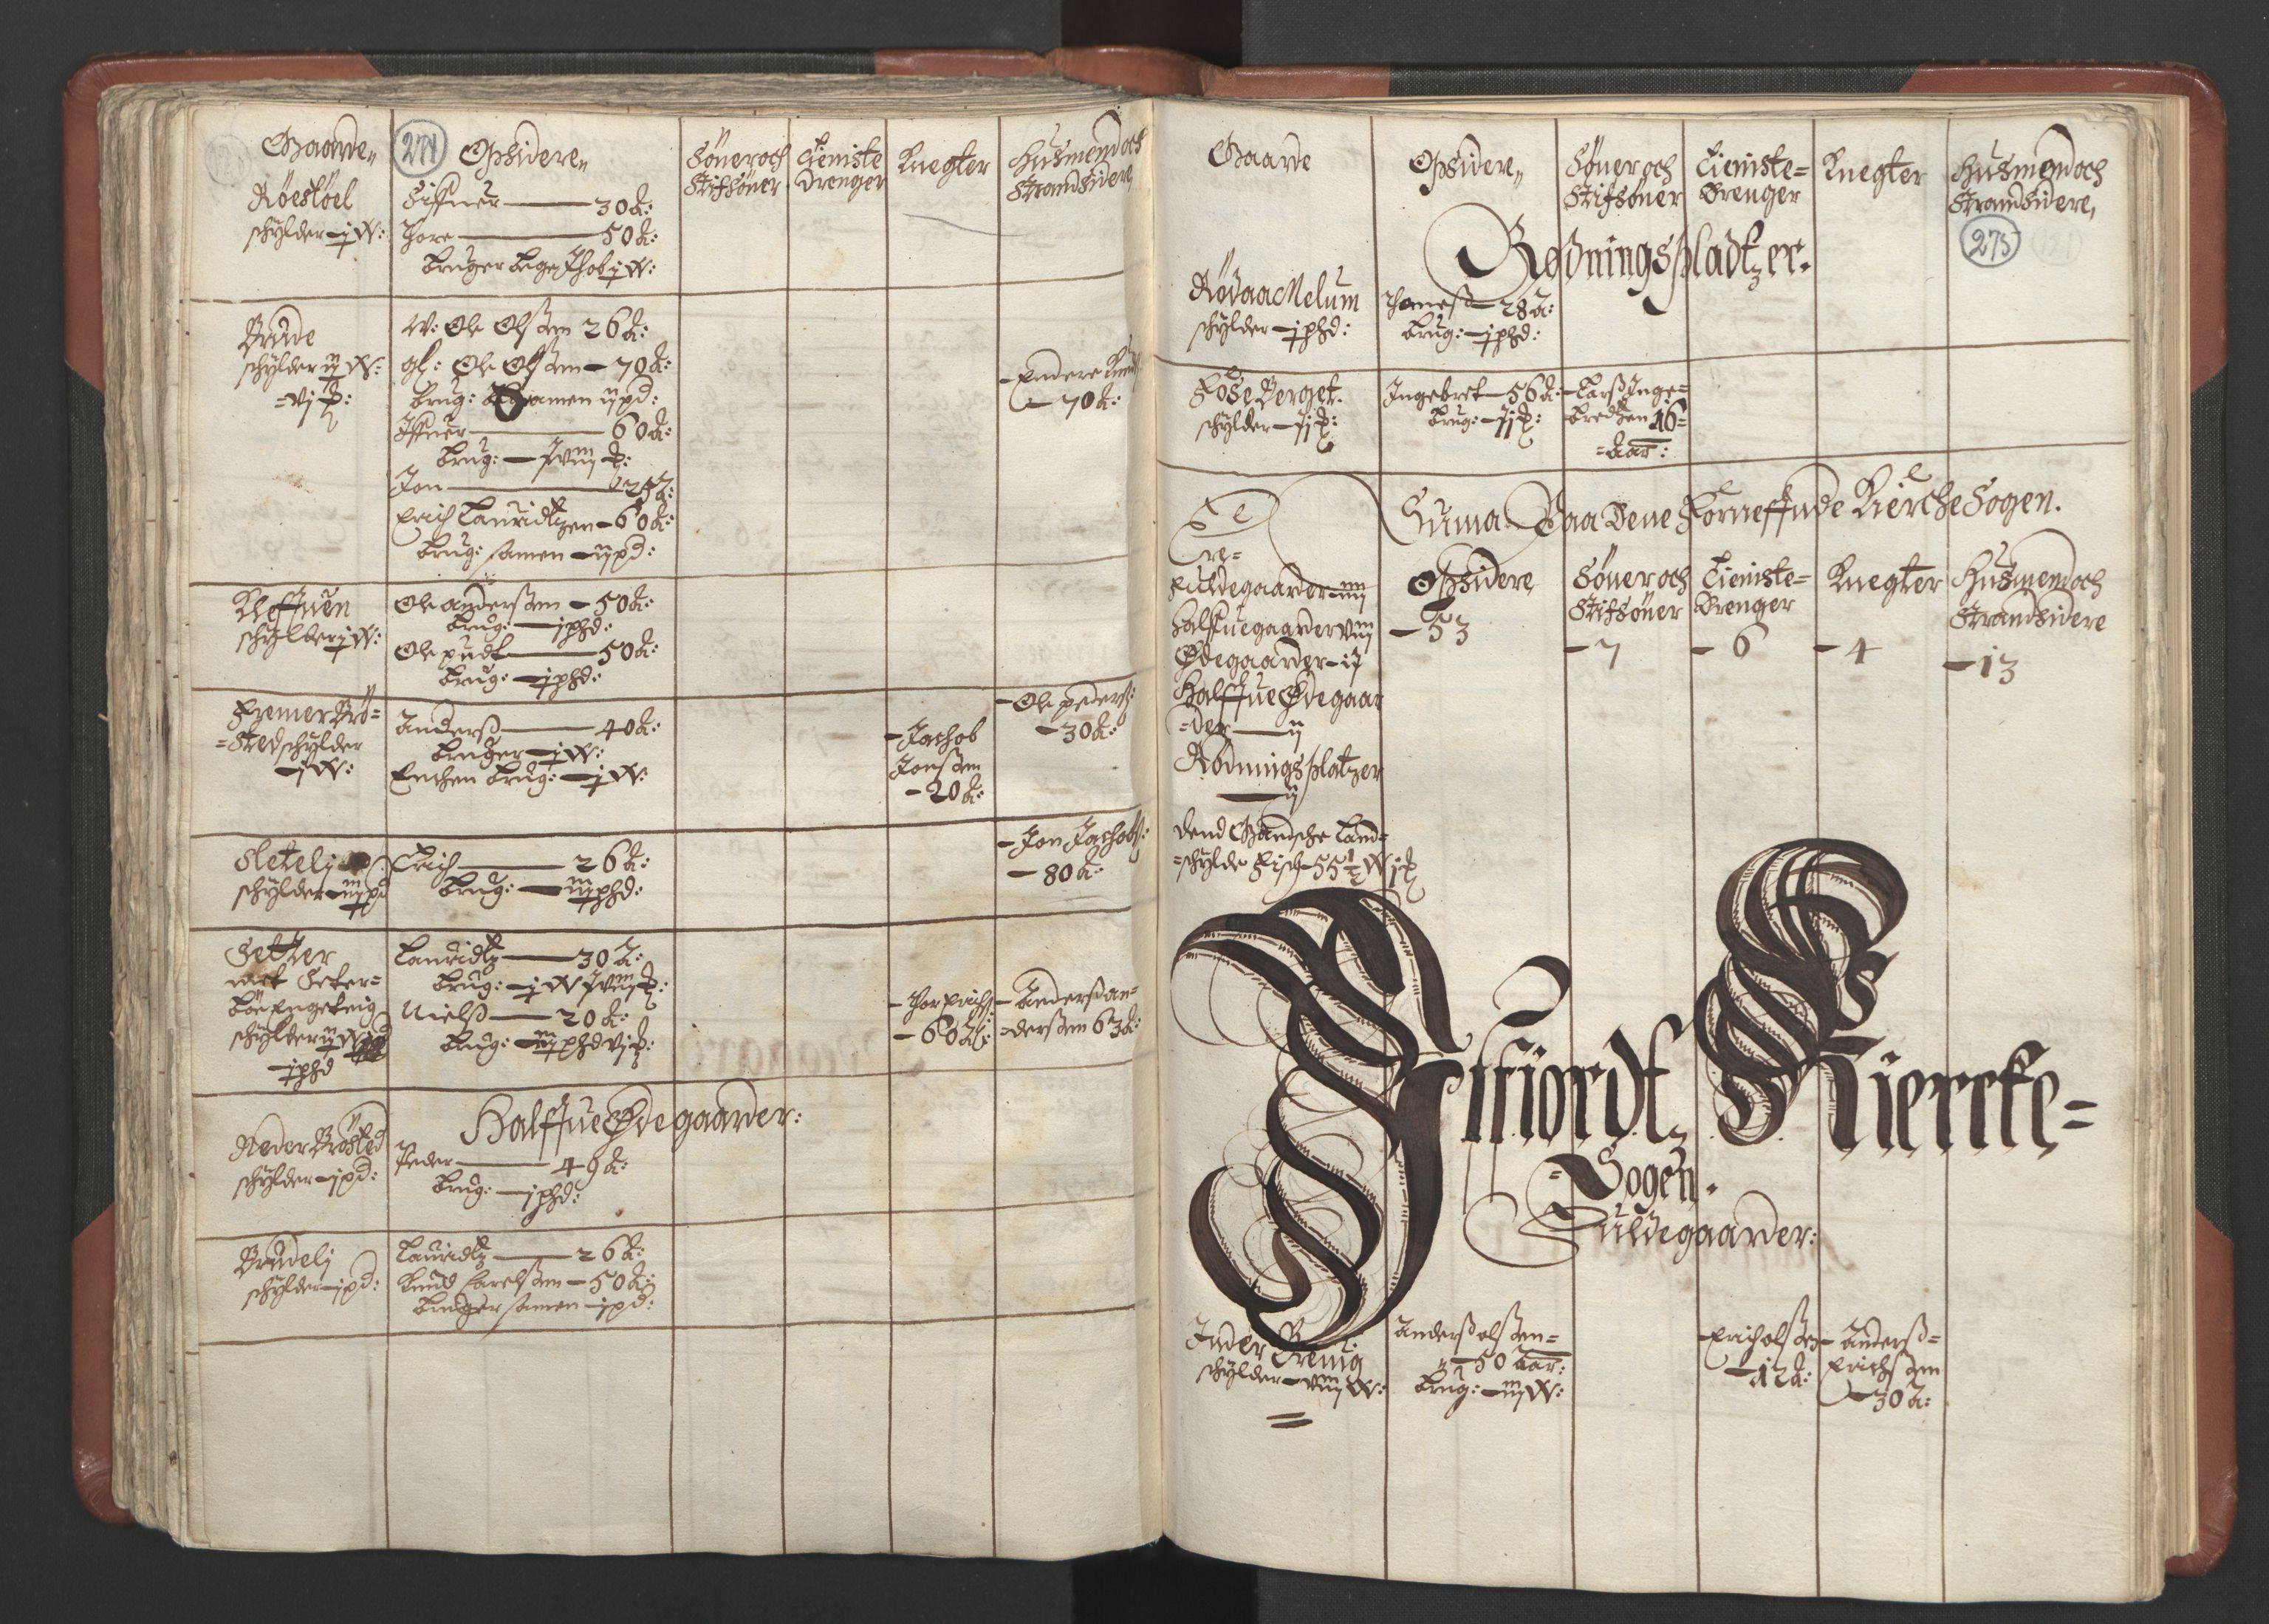 RA, Fogdenes og sorenskrivernes manntall 1664-1666, nr. 16: Romsdal fogderi og Sunnmøre fogderi, 1664-1665, s. 274-275